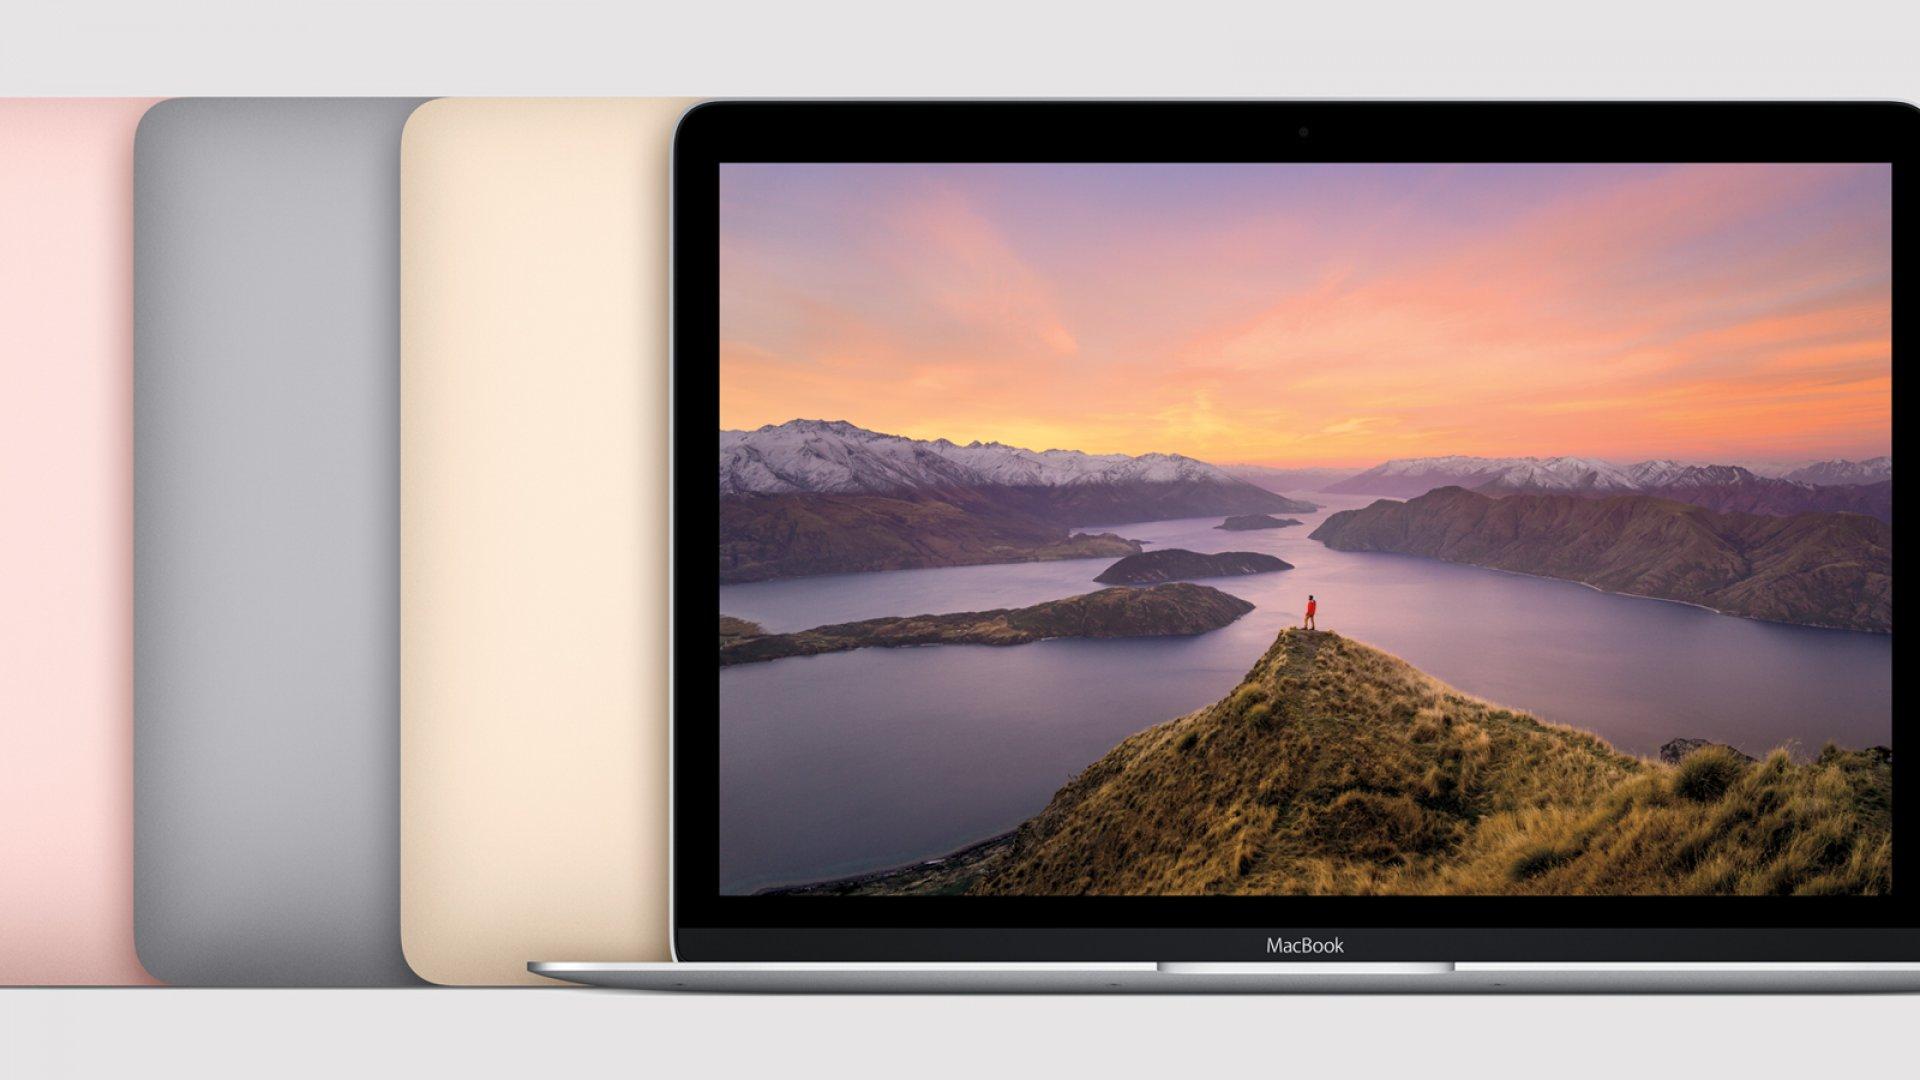 The Best Apple MacBook Ever Just Debuted